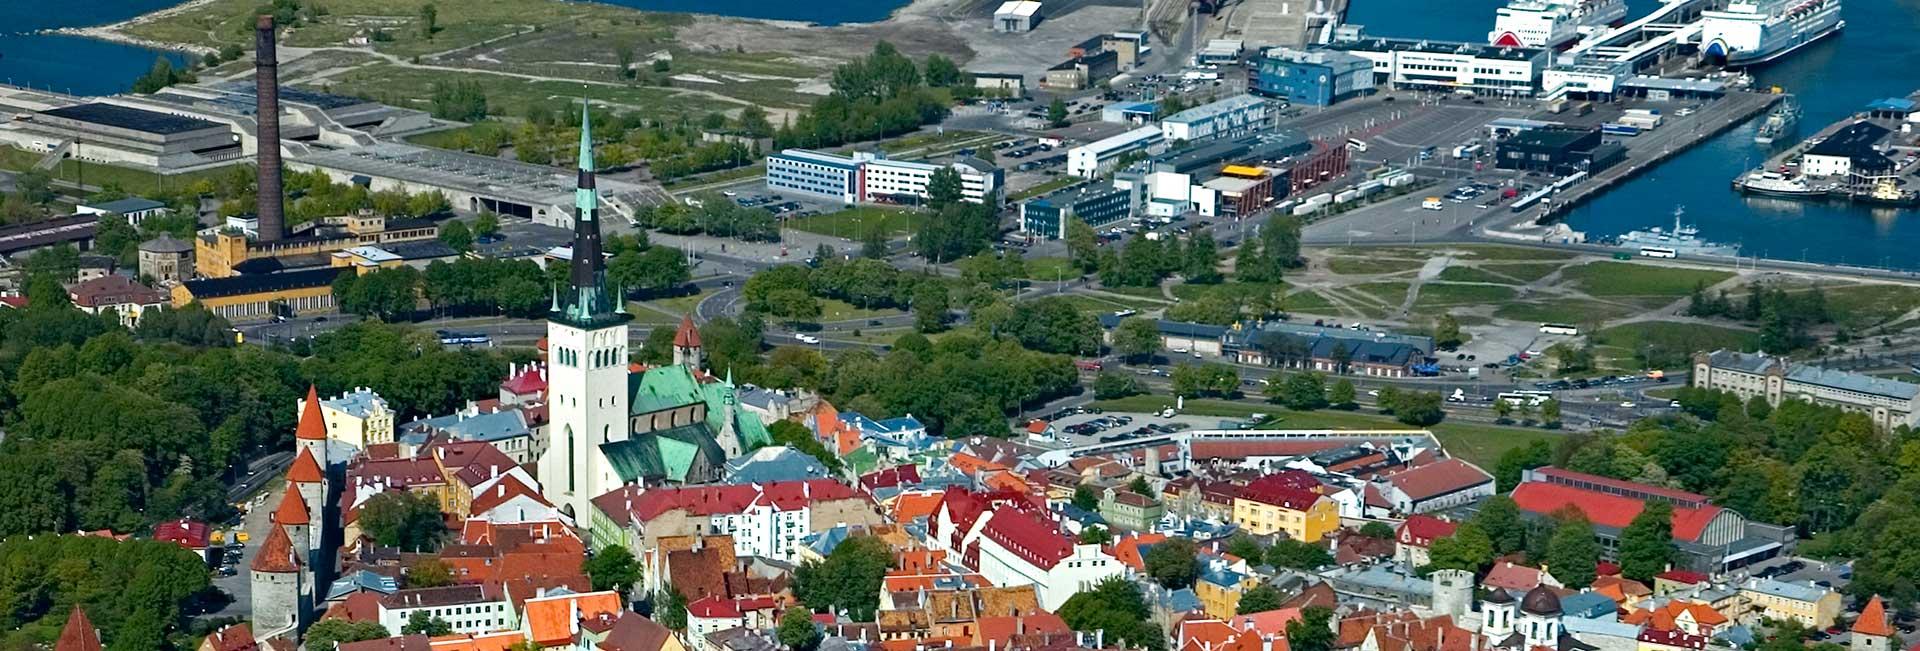 Tallinn, Estonia. Photo credit: Martin Klimenta